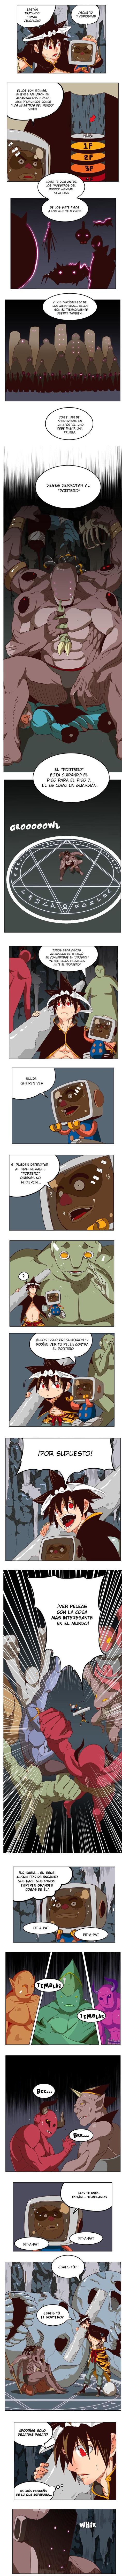 http://c5.ninemanga.com/es_manga/37/485/439574/a6b032cc13e531b6fc9824b18154da41.jpg Page 4